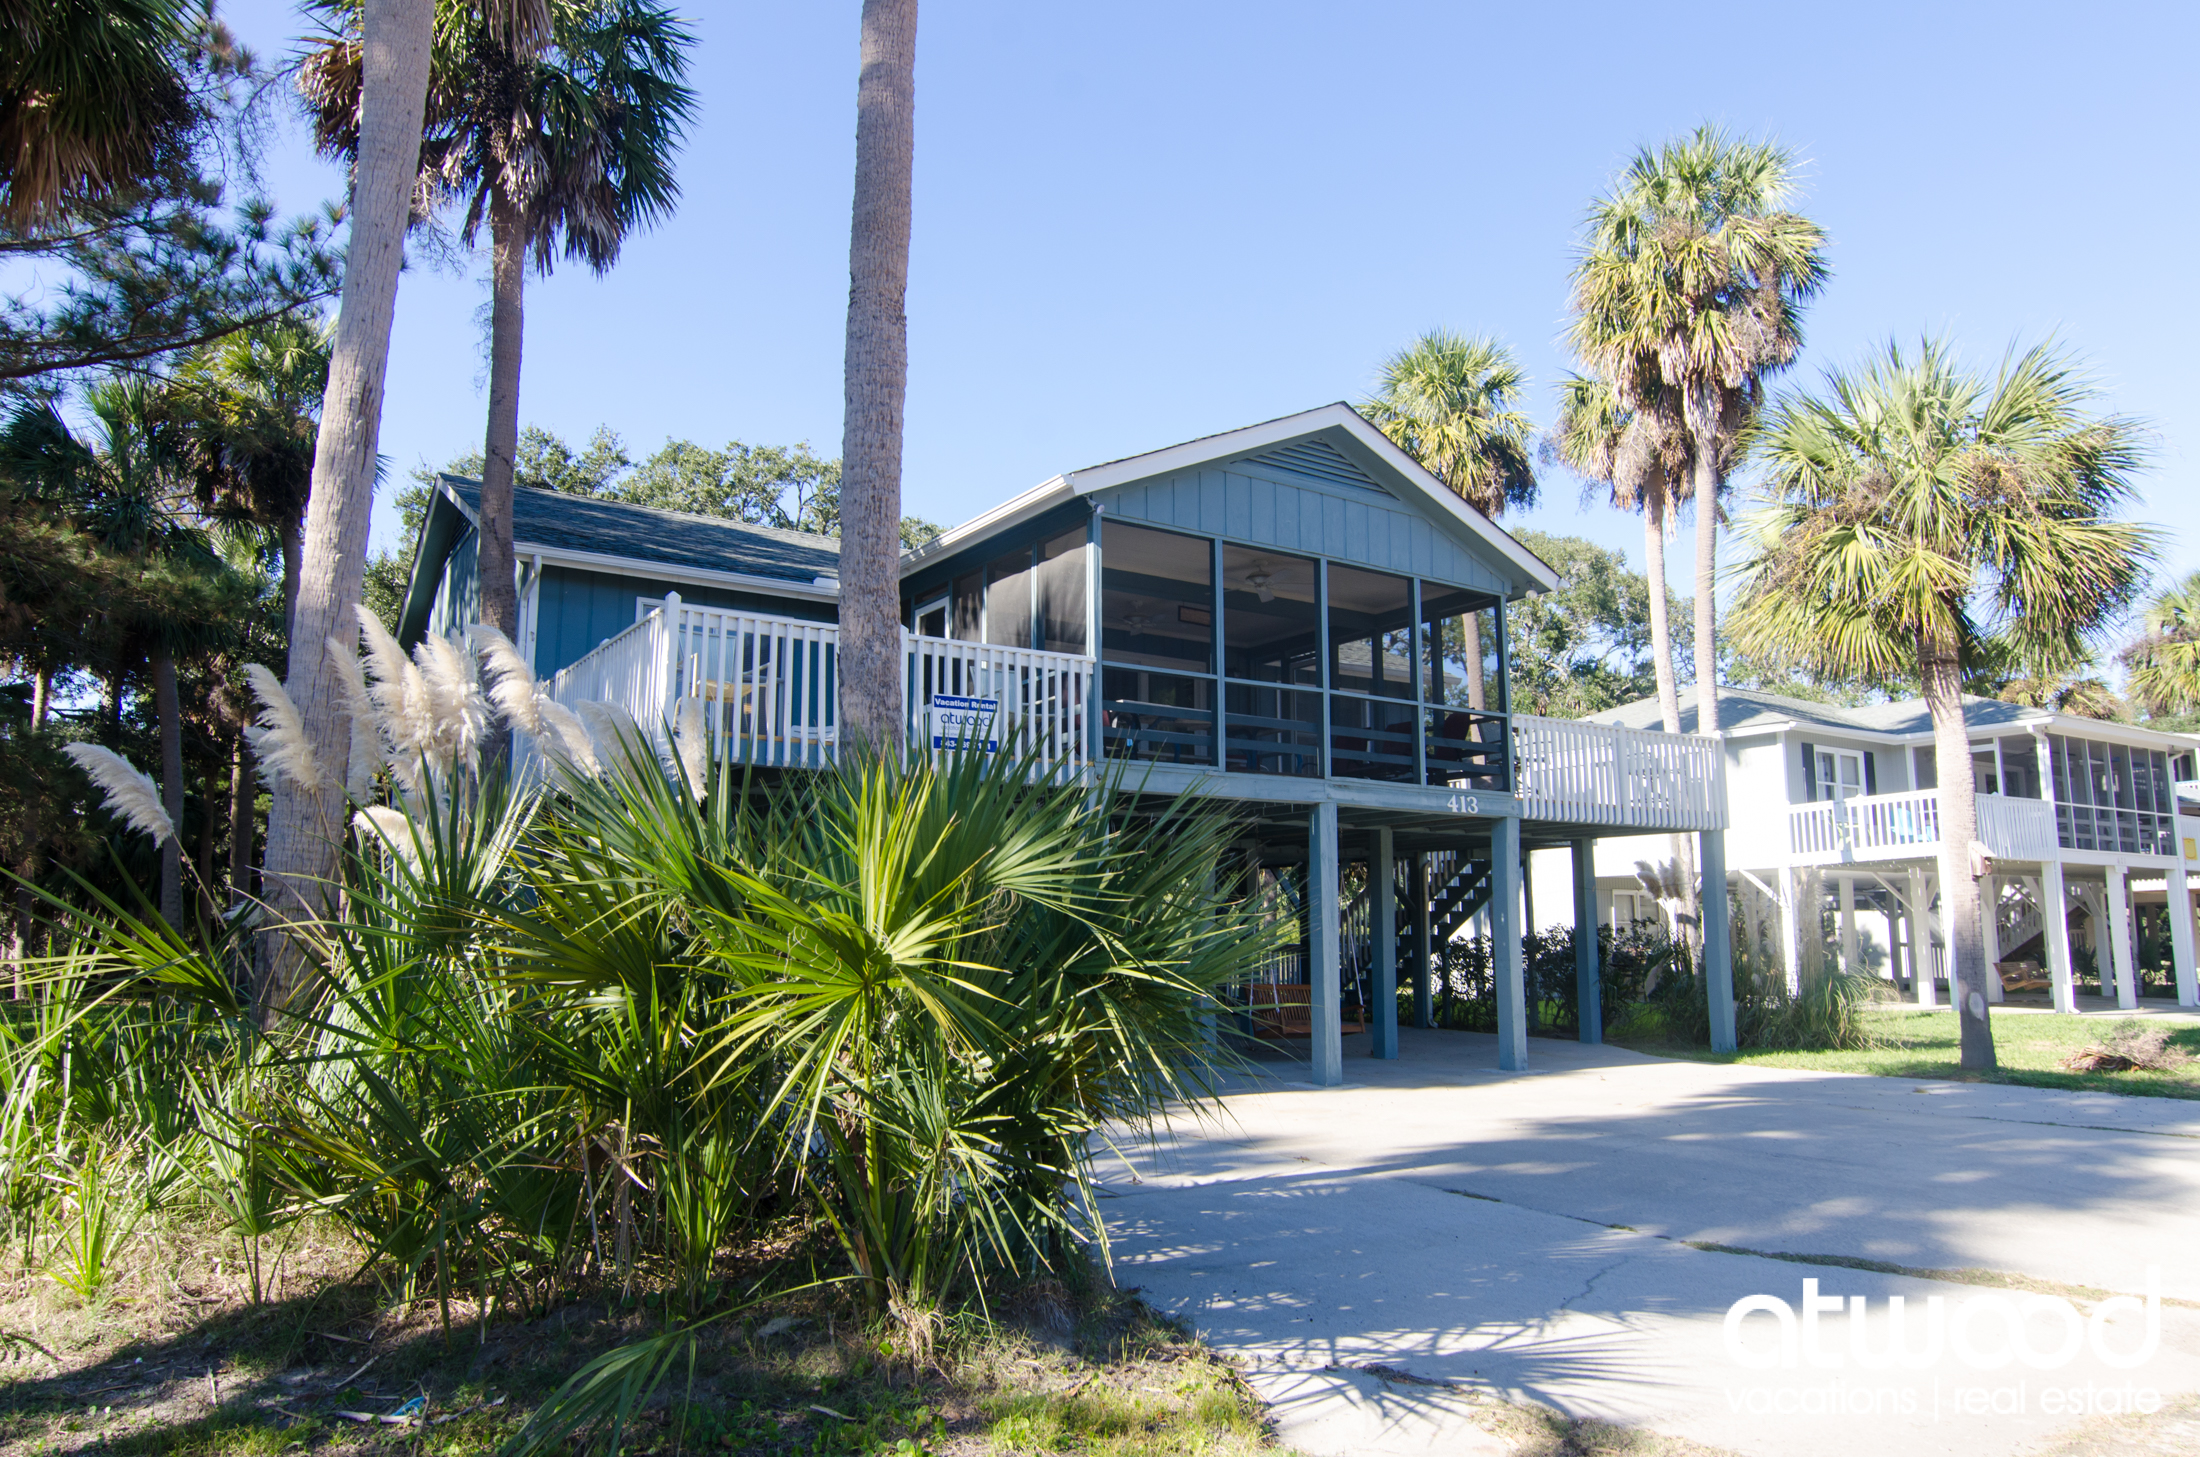 Pompano Crab Inn